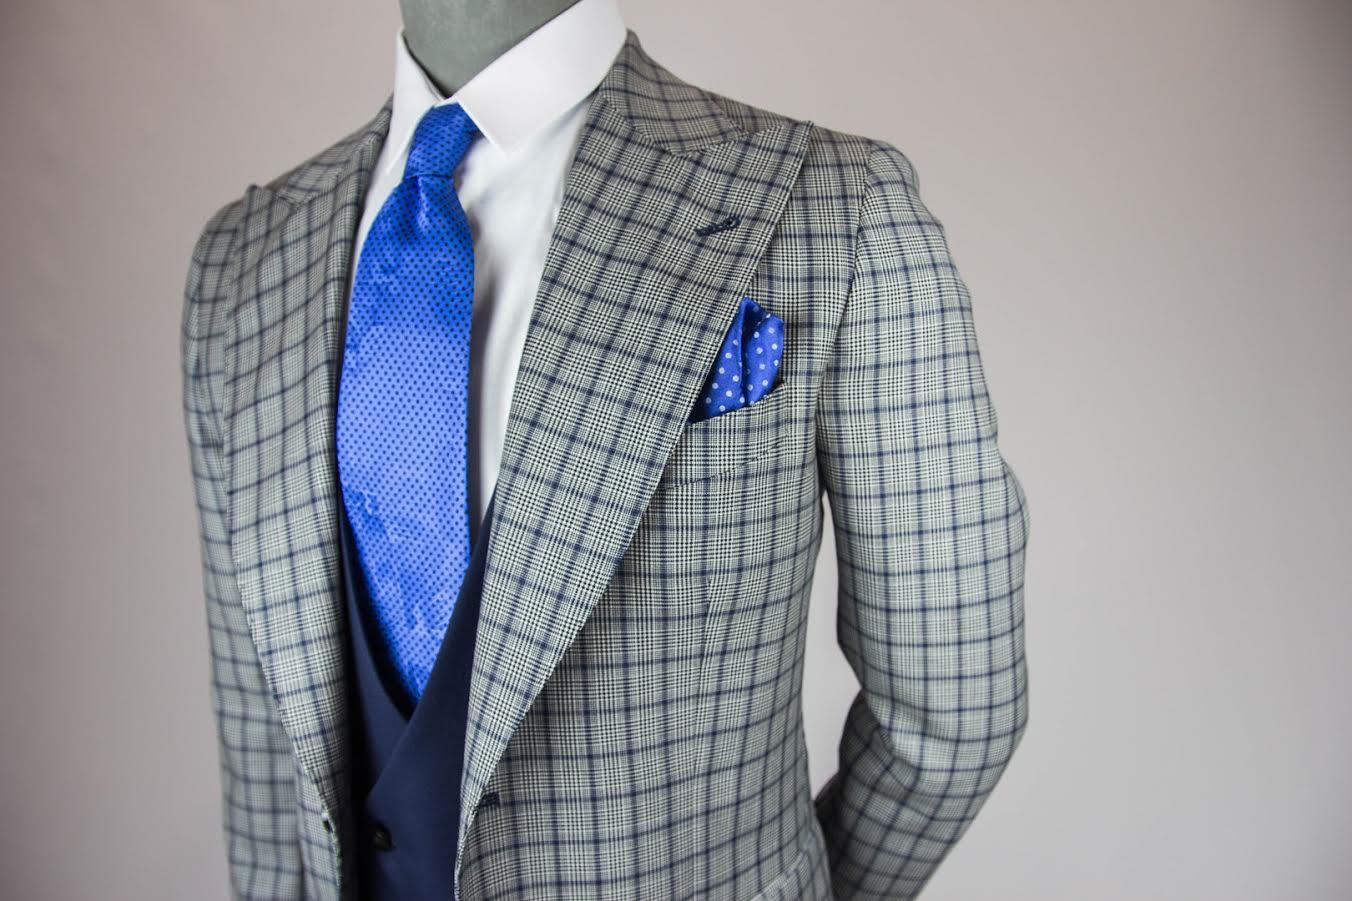 Matrimonio Country Chic Uomo : Vestiti uomo shabby chic look informale gil moda